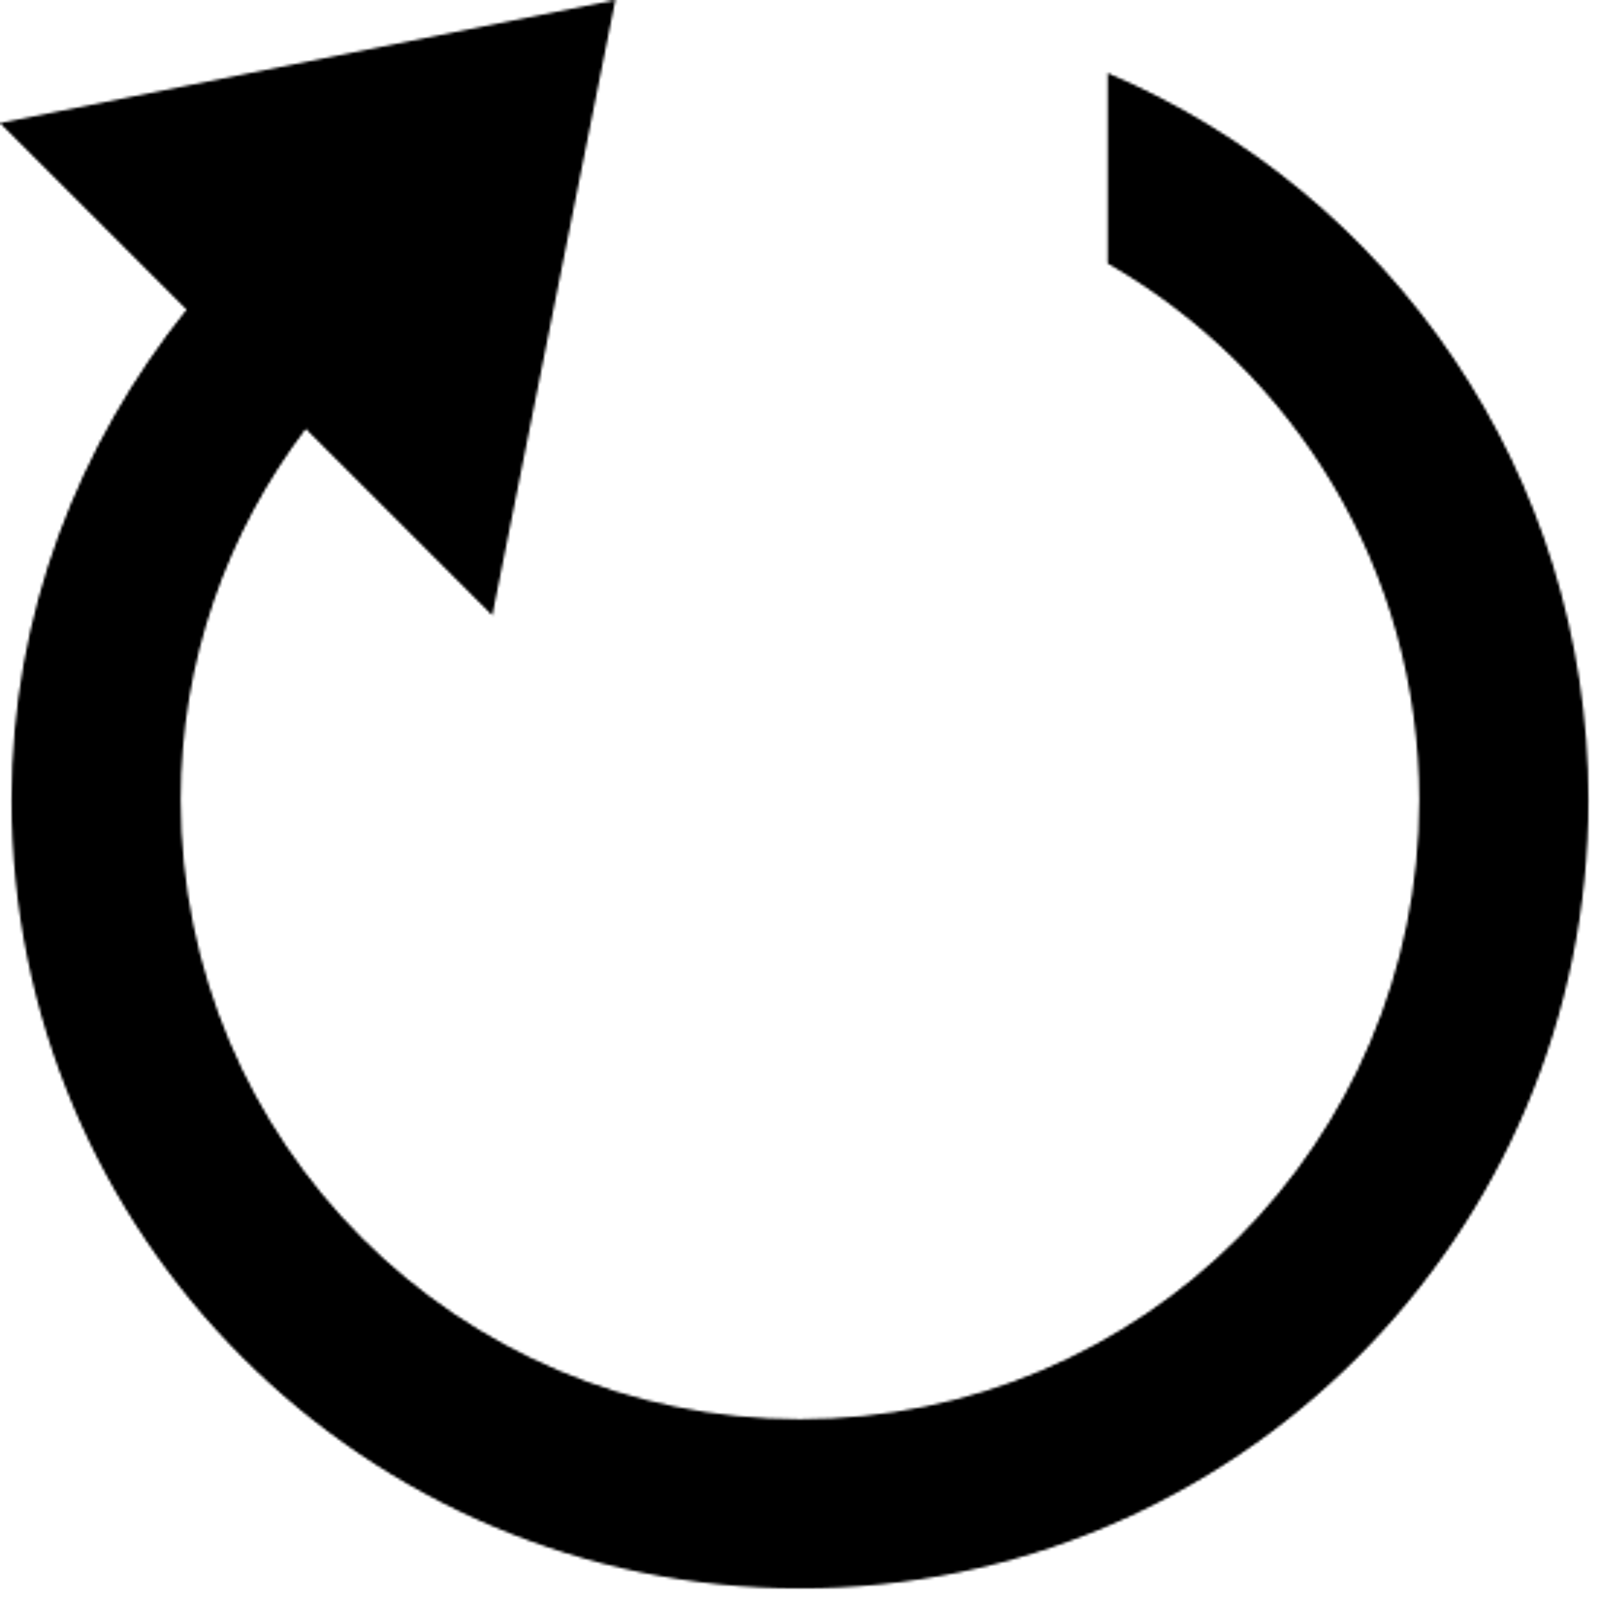 Перезапуск icon